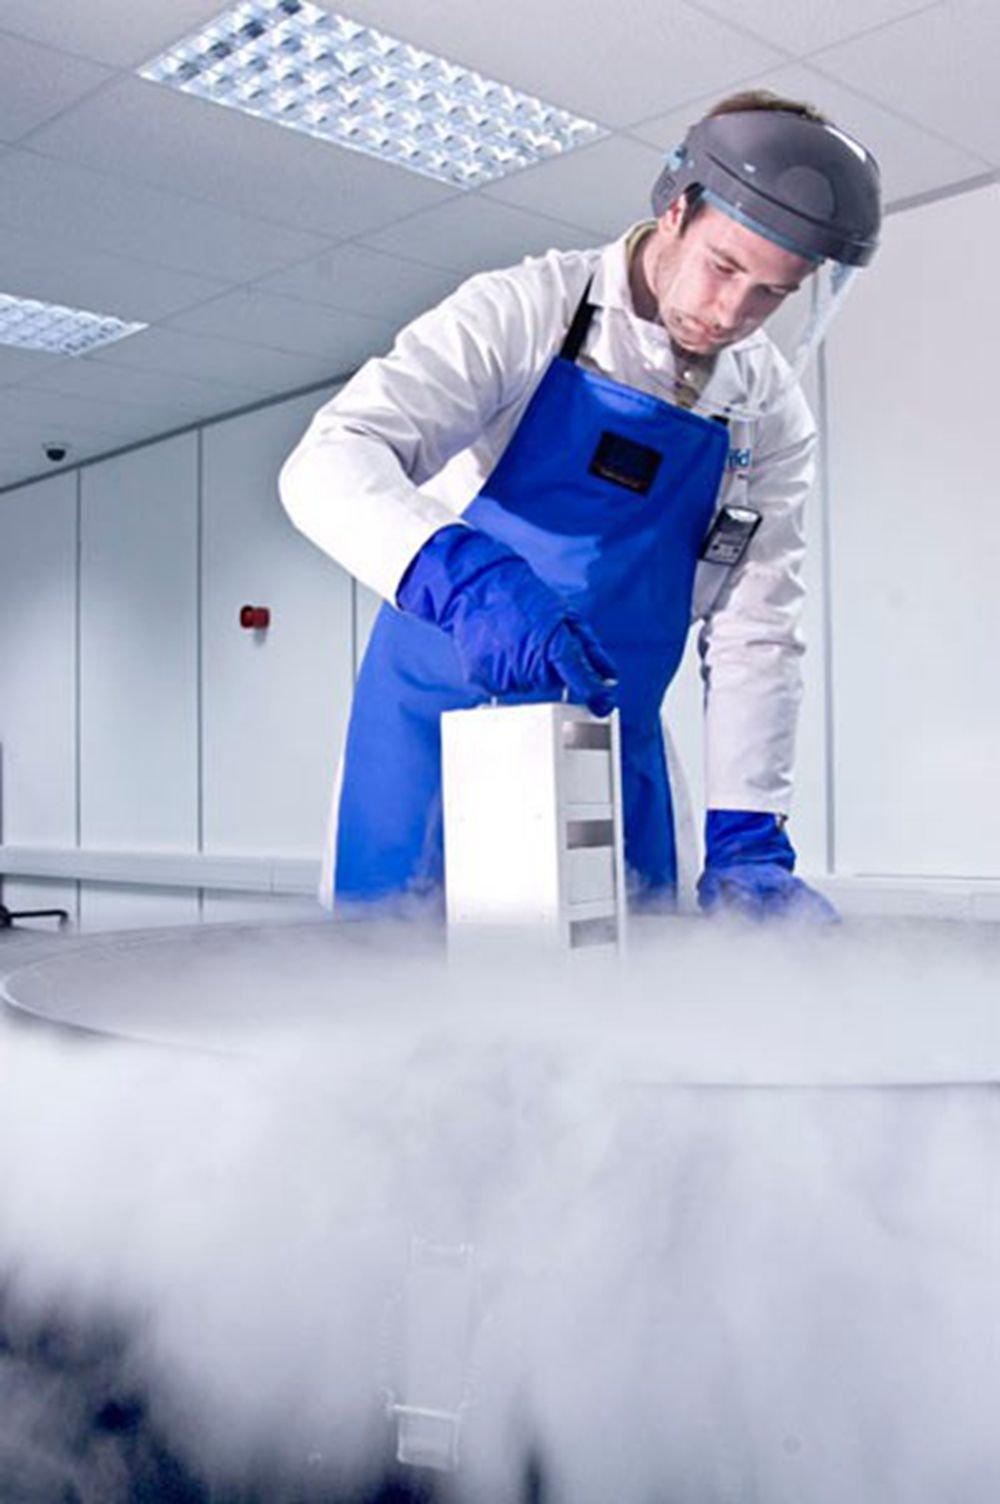 Holulo Safety Apparel Cryogenic Apron and PTFE Waterproof Cryogenic Safety Bib Apron 43''X26'' (XL)